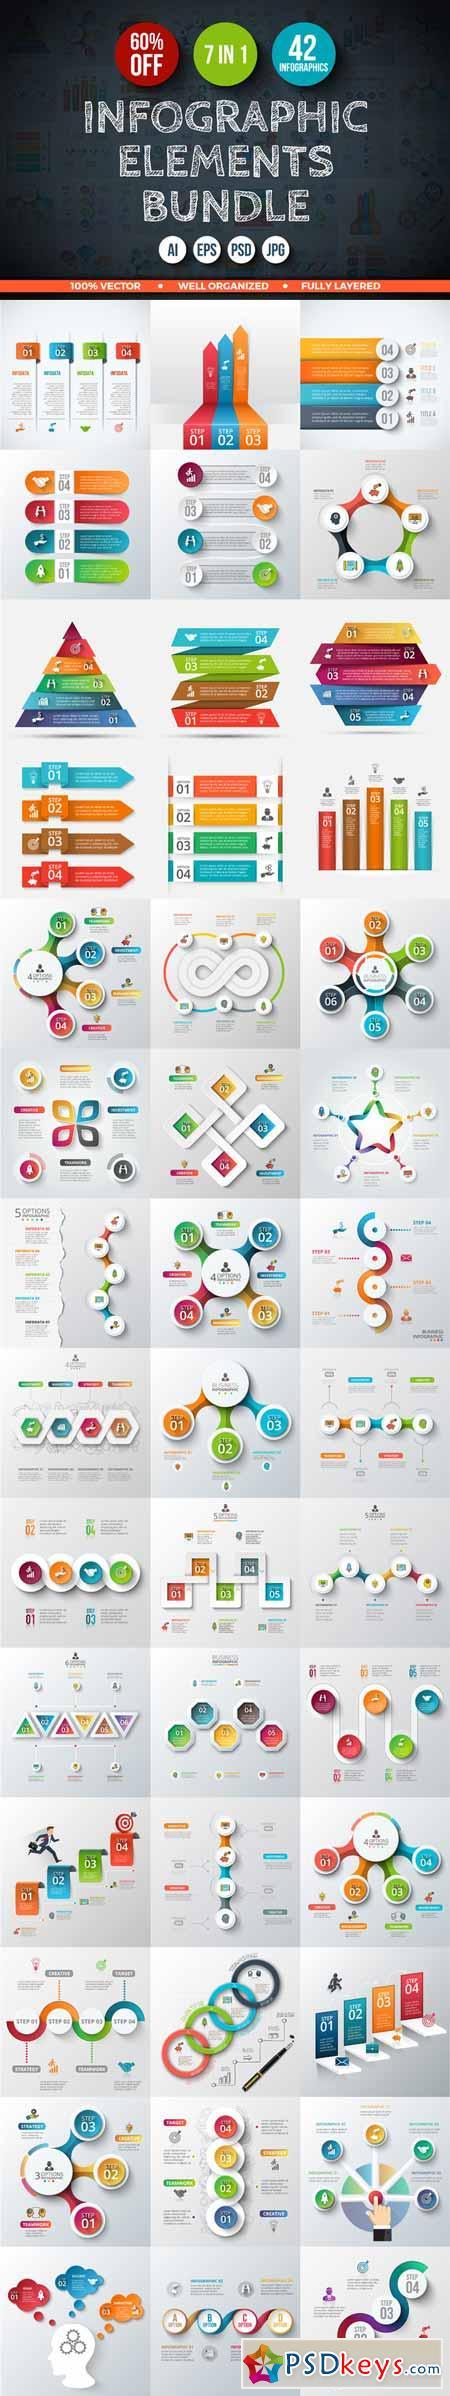 Best Infographic Elements | TemplateMonster